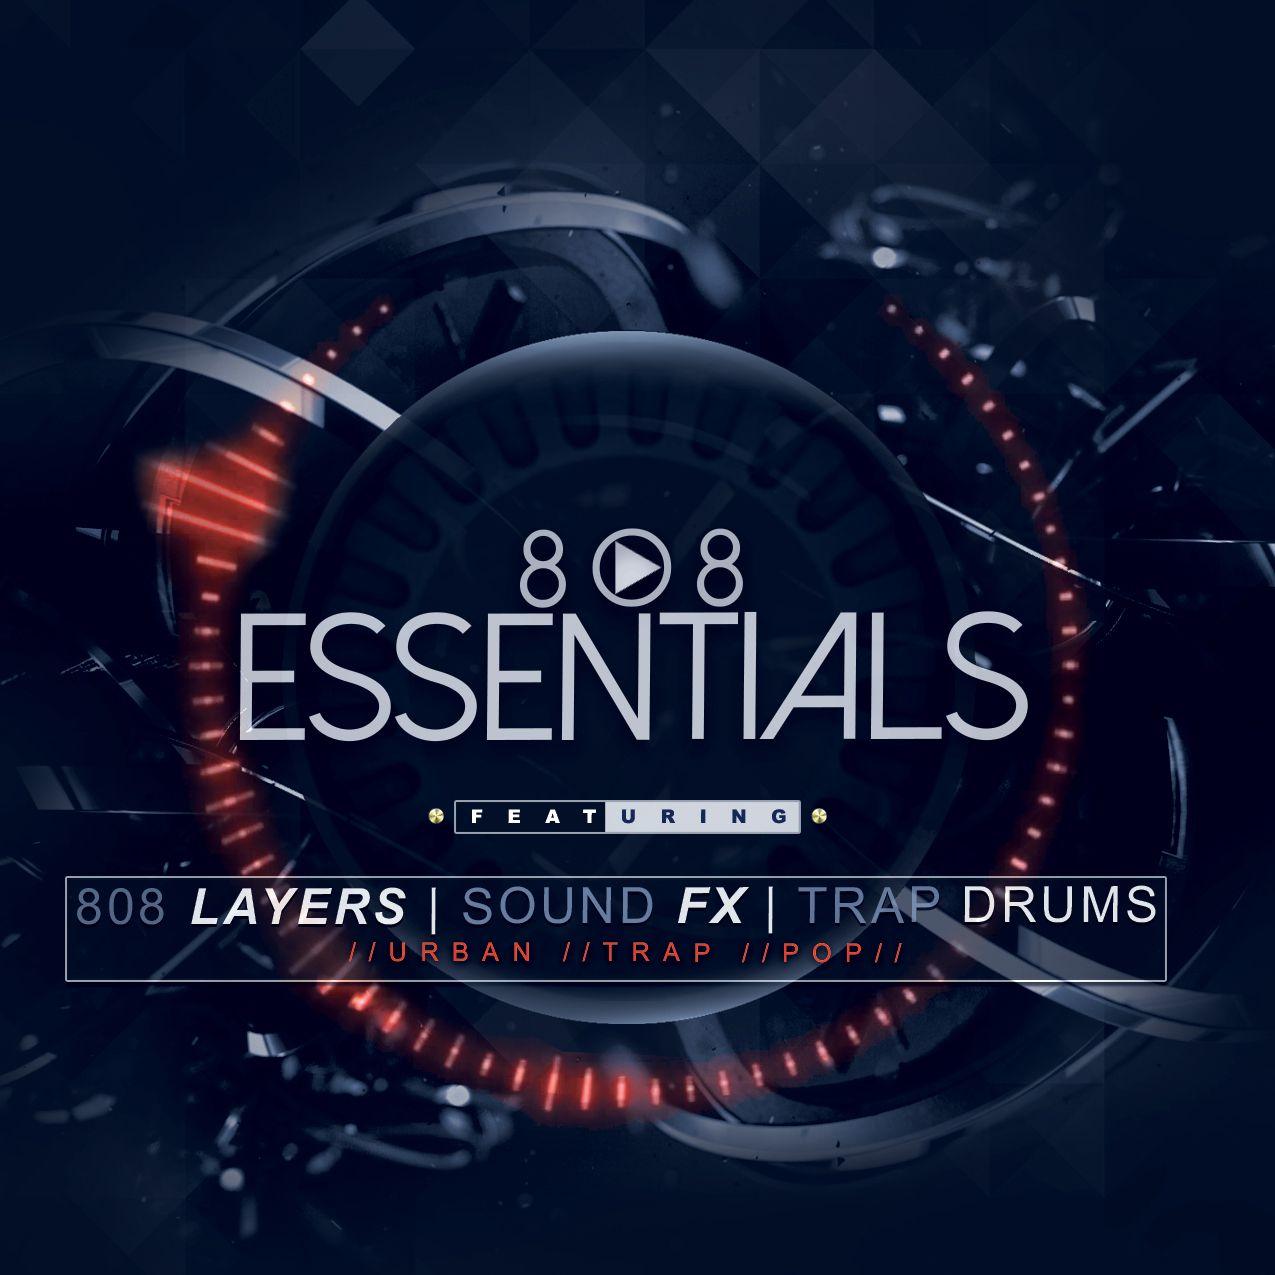 808 Essentials Bass Layers, SFX & Drums Drum kits